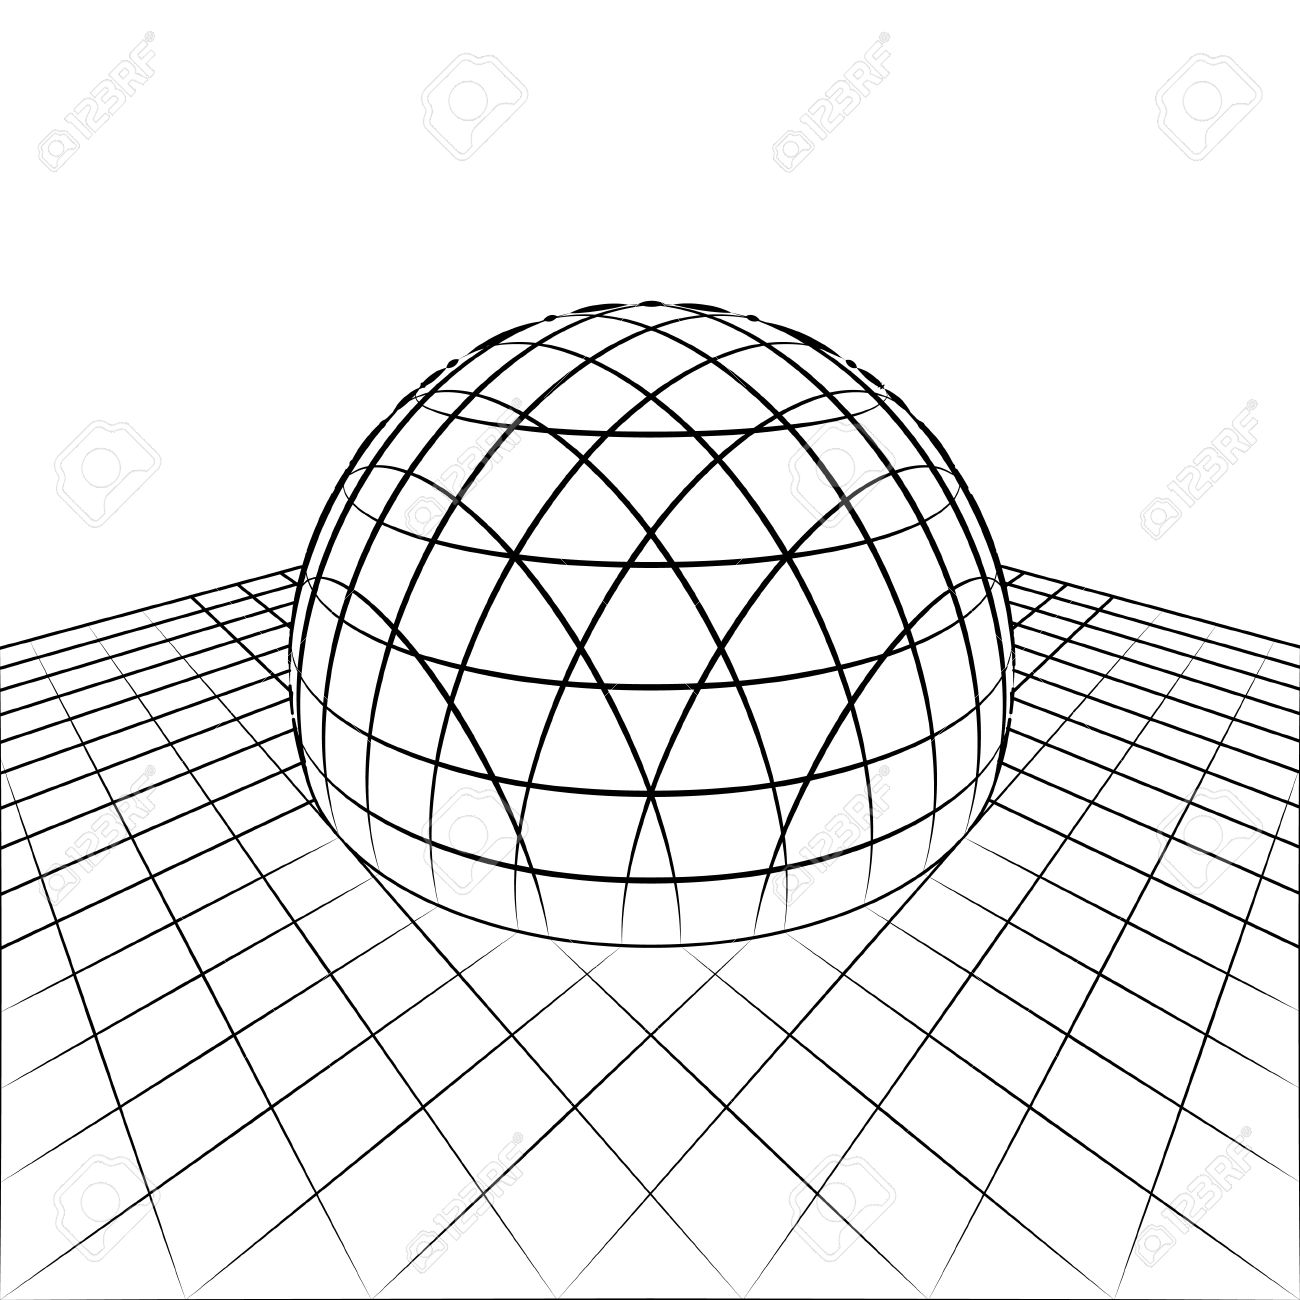 Demi Sphere En Ligne De Quadrillage Perspective Dessin Illustration